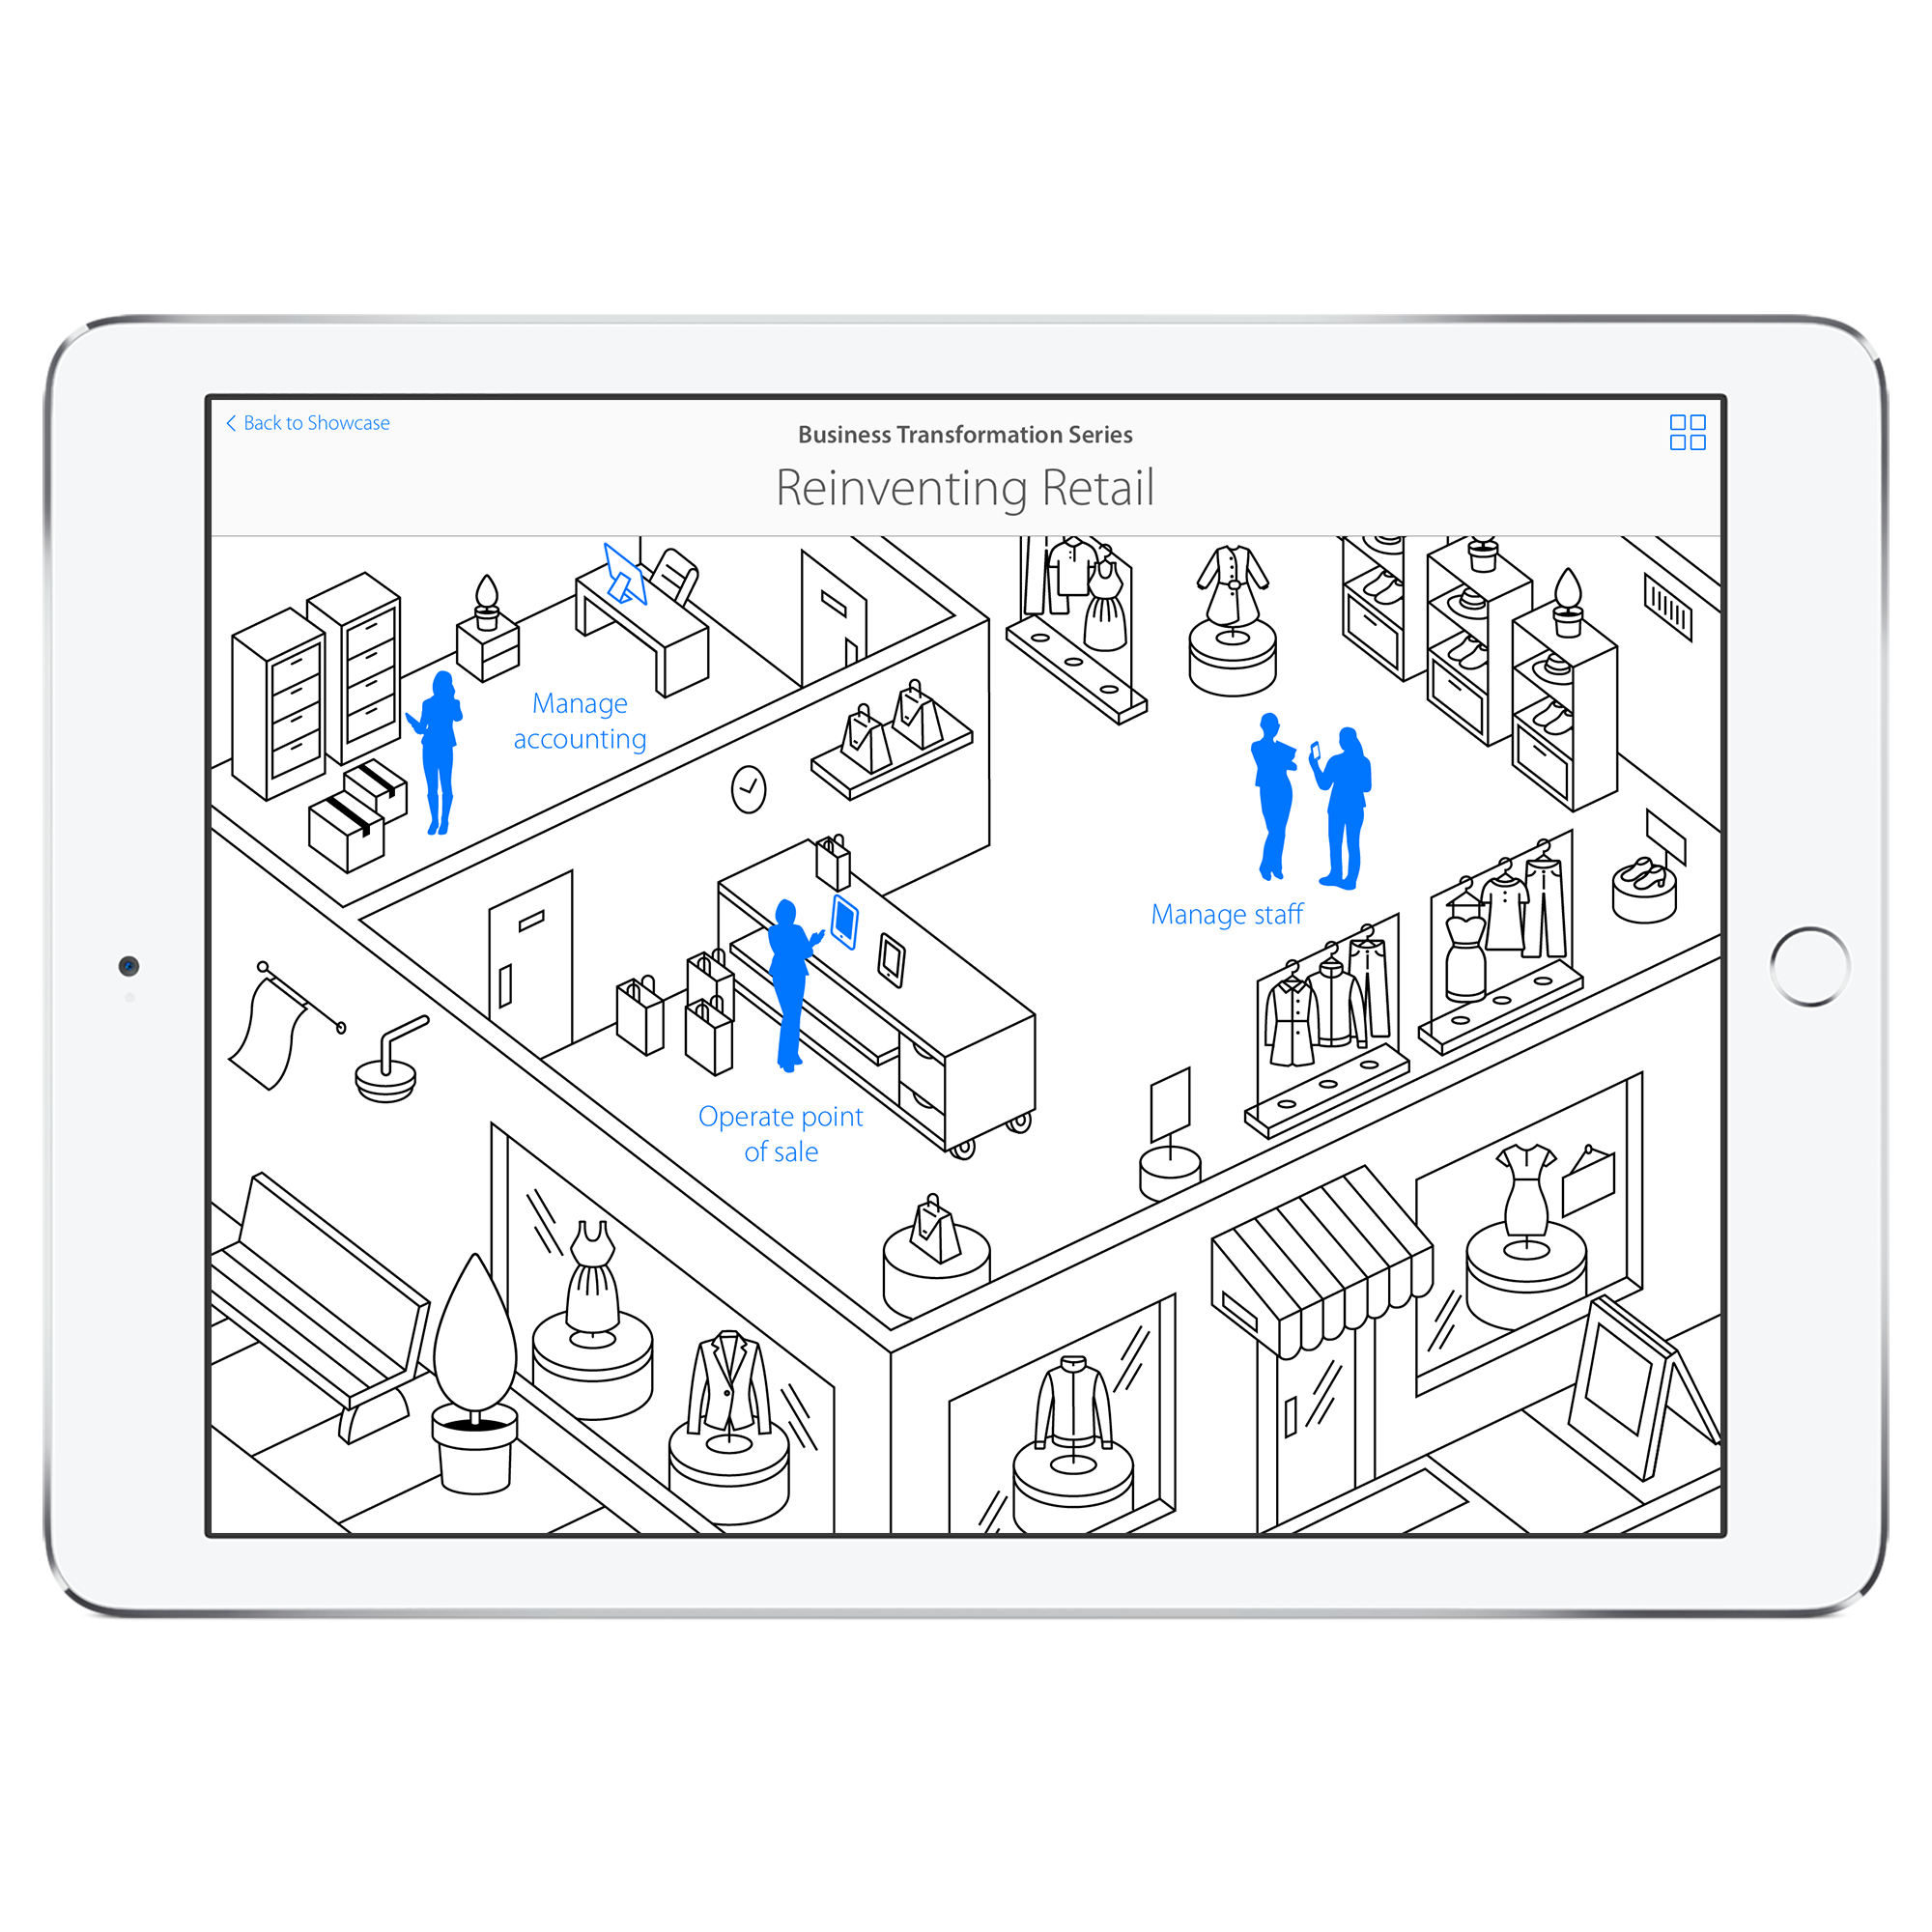 Showcase,Business Transformation Series- Reinventing Retail Episode (landing page)